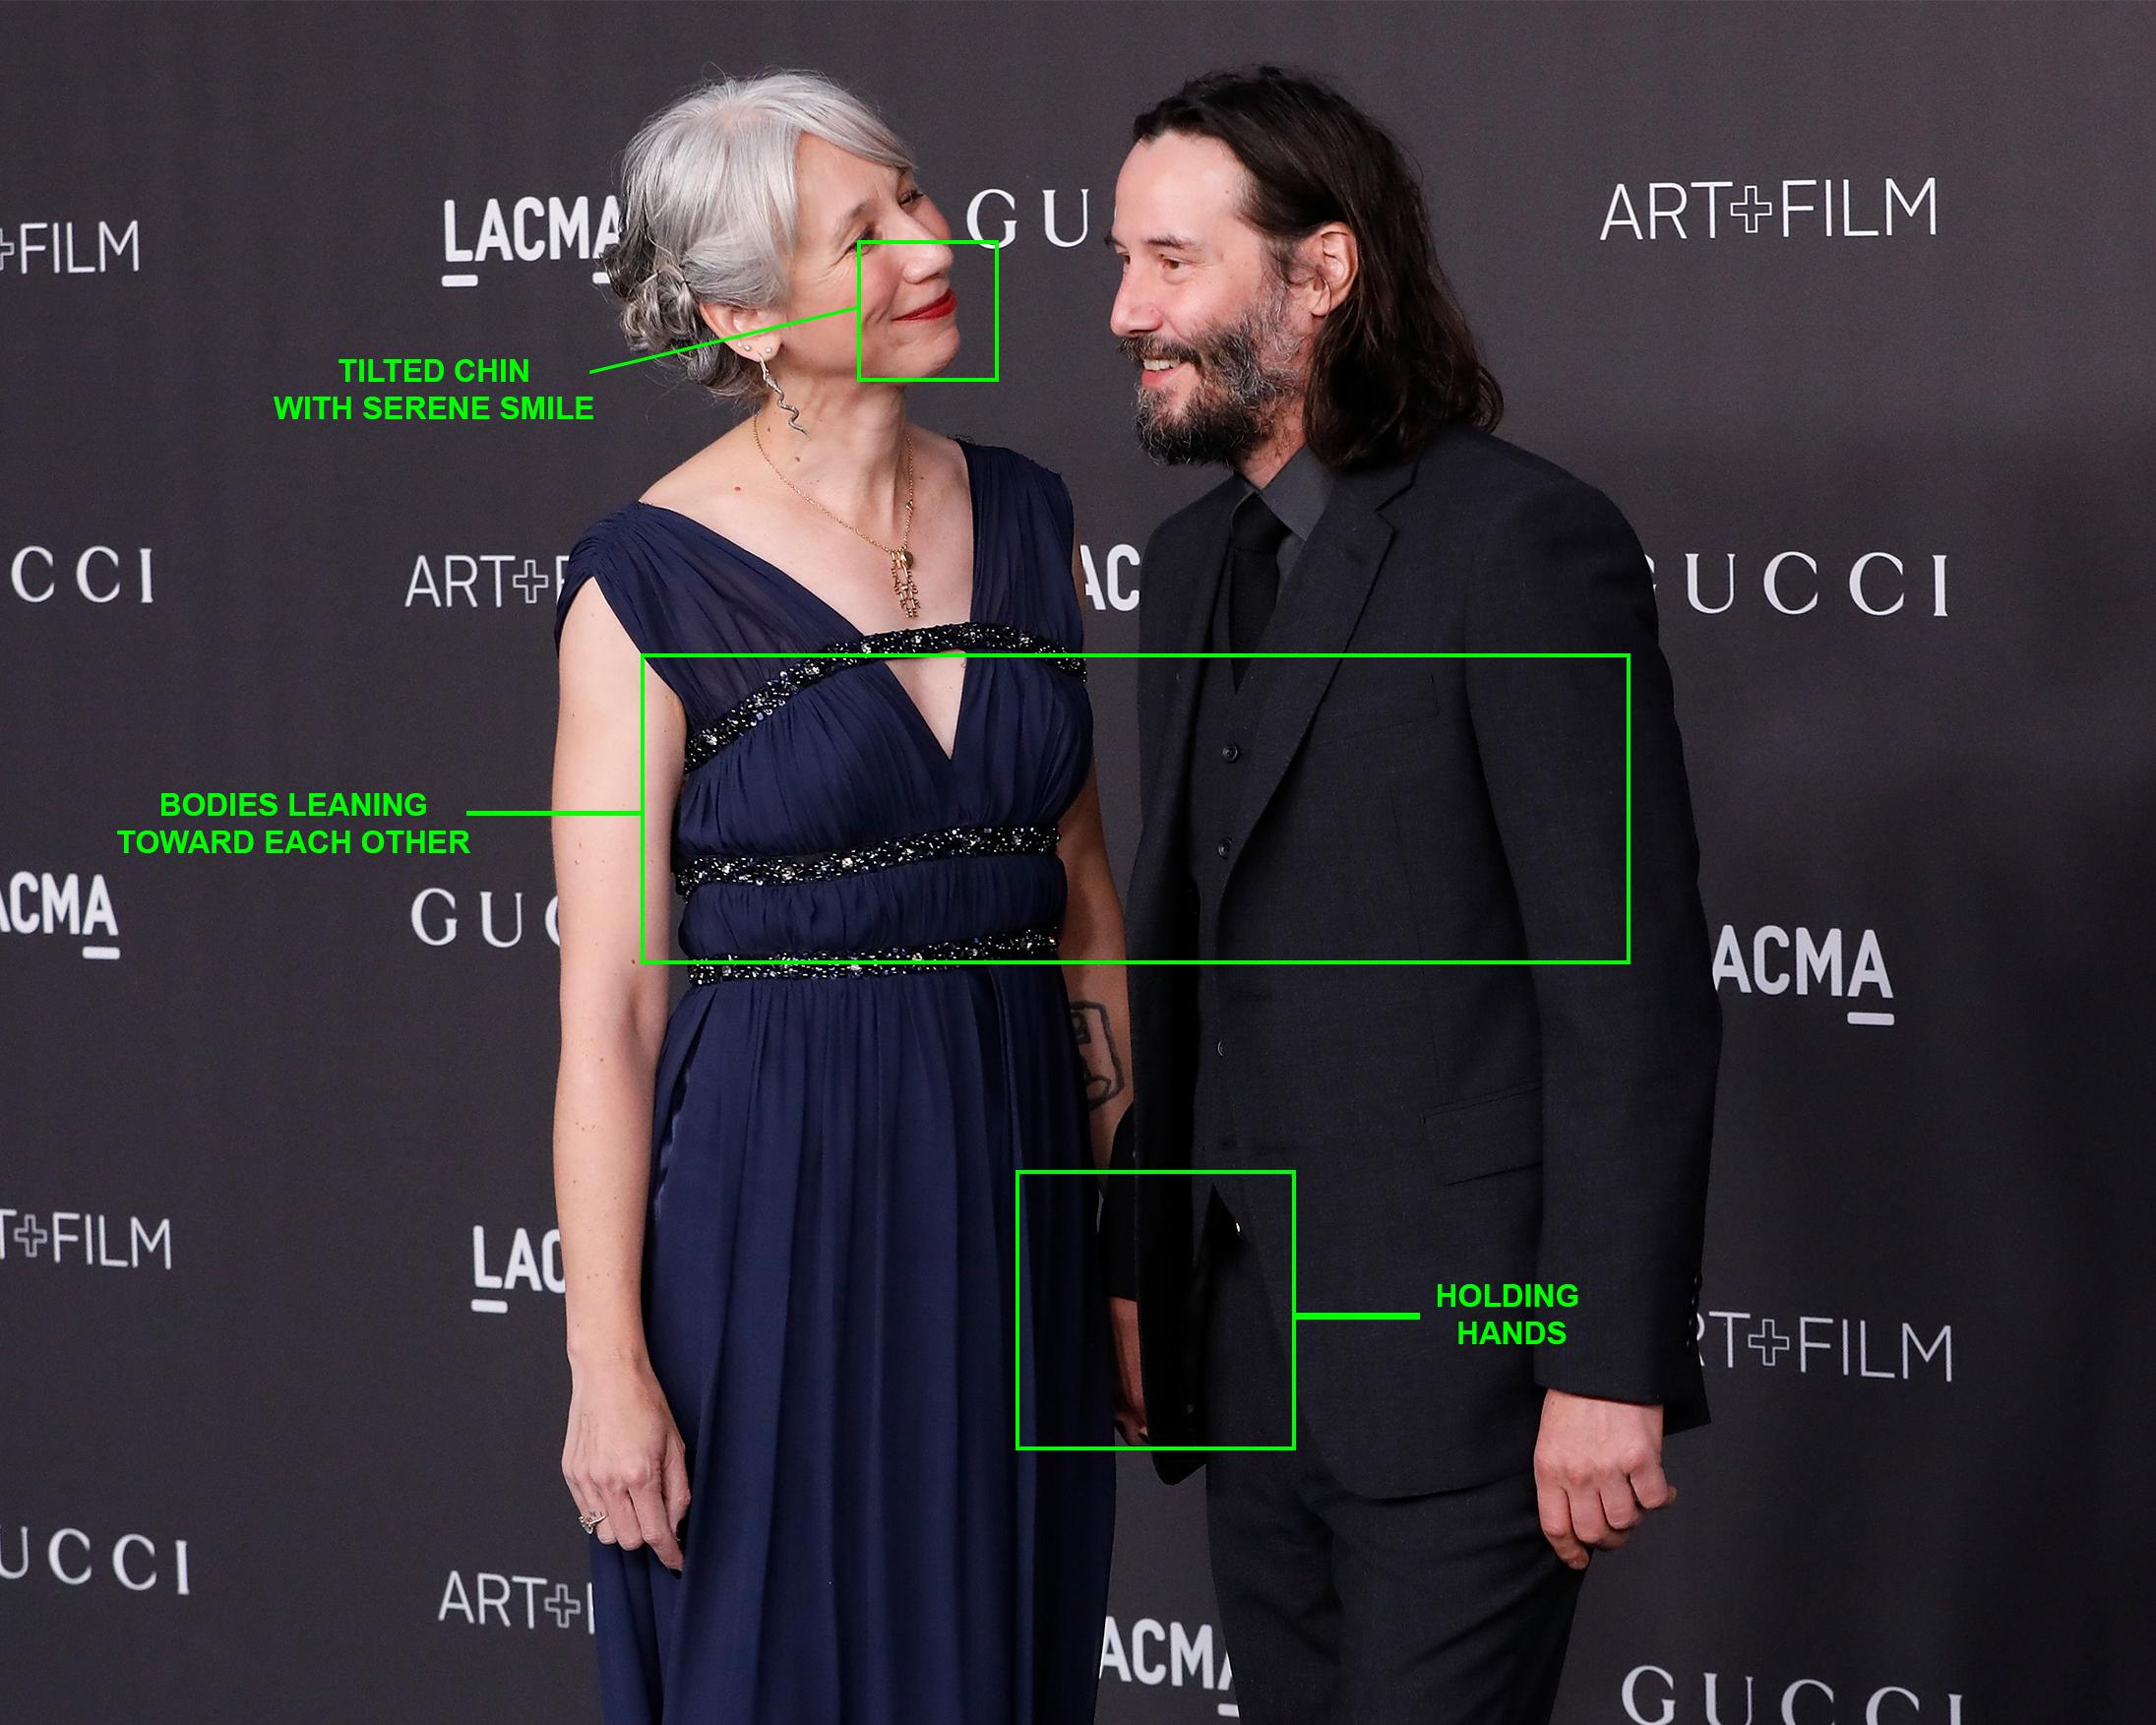 Alexandra Grant and Keanu Reeves